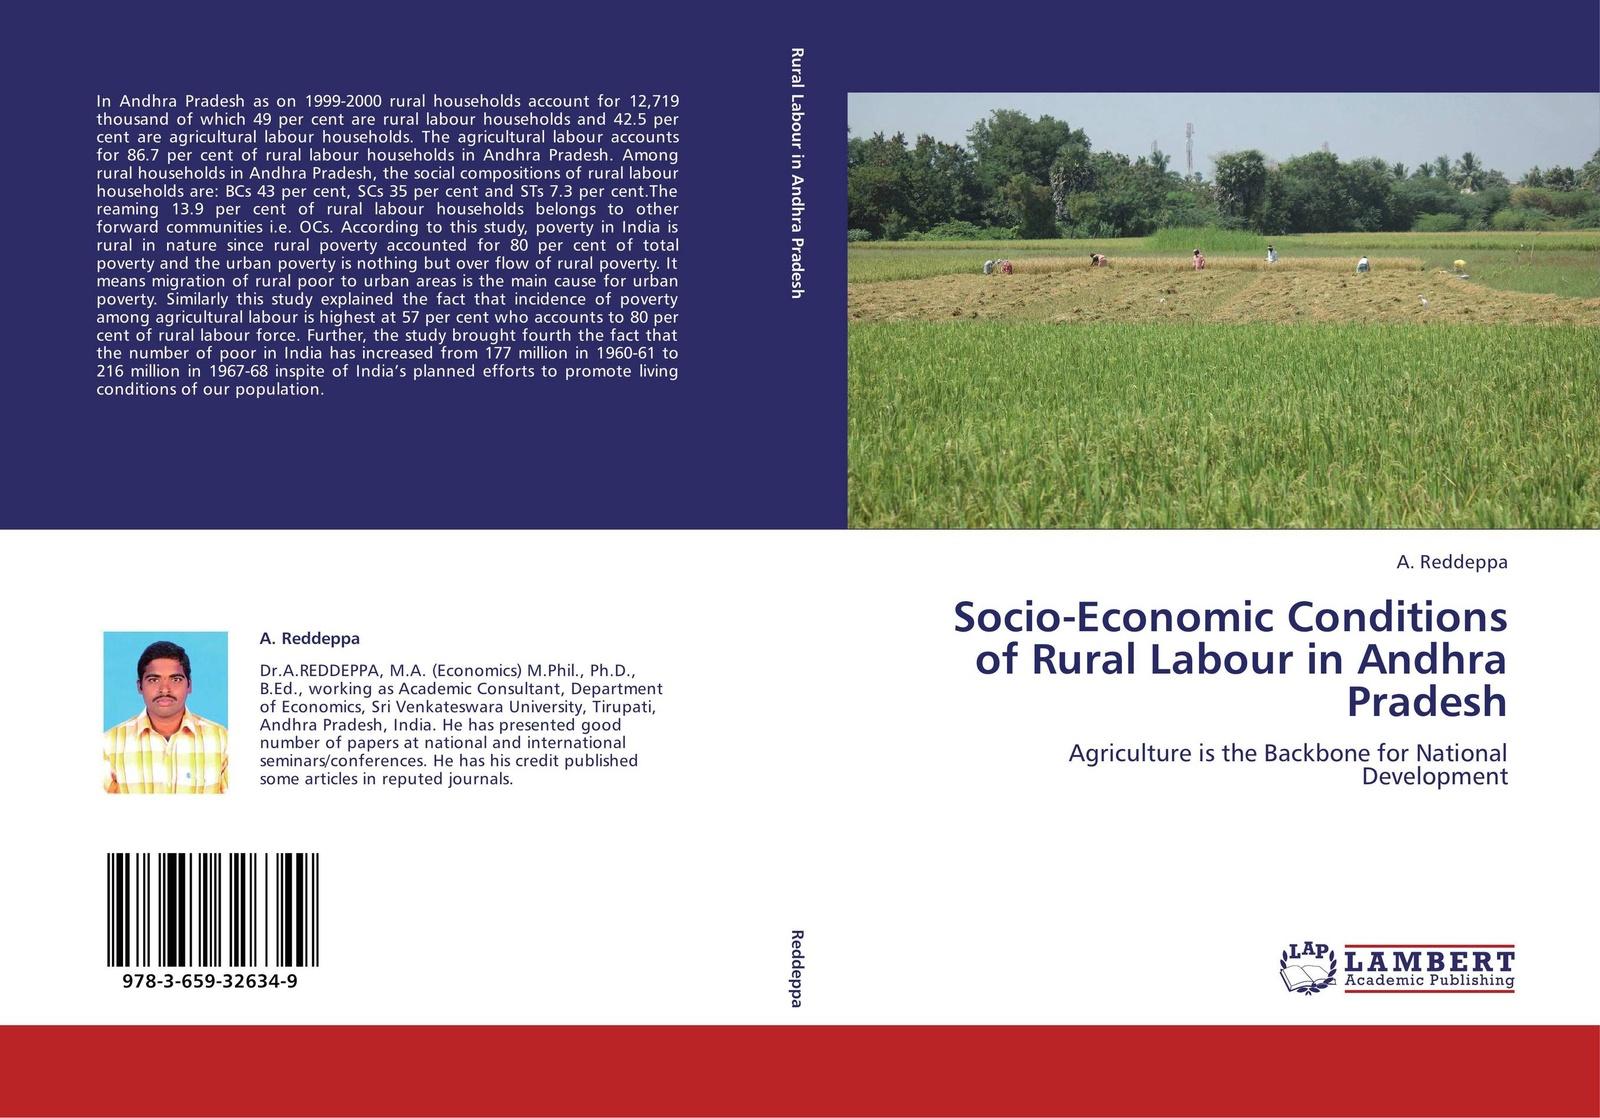 A. Reddeppa Socio-Economic Conditions of Rural Labour in Andhra Pradesh цена в Москве и Питере